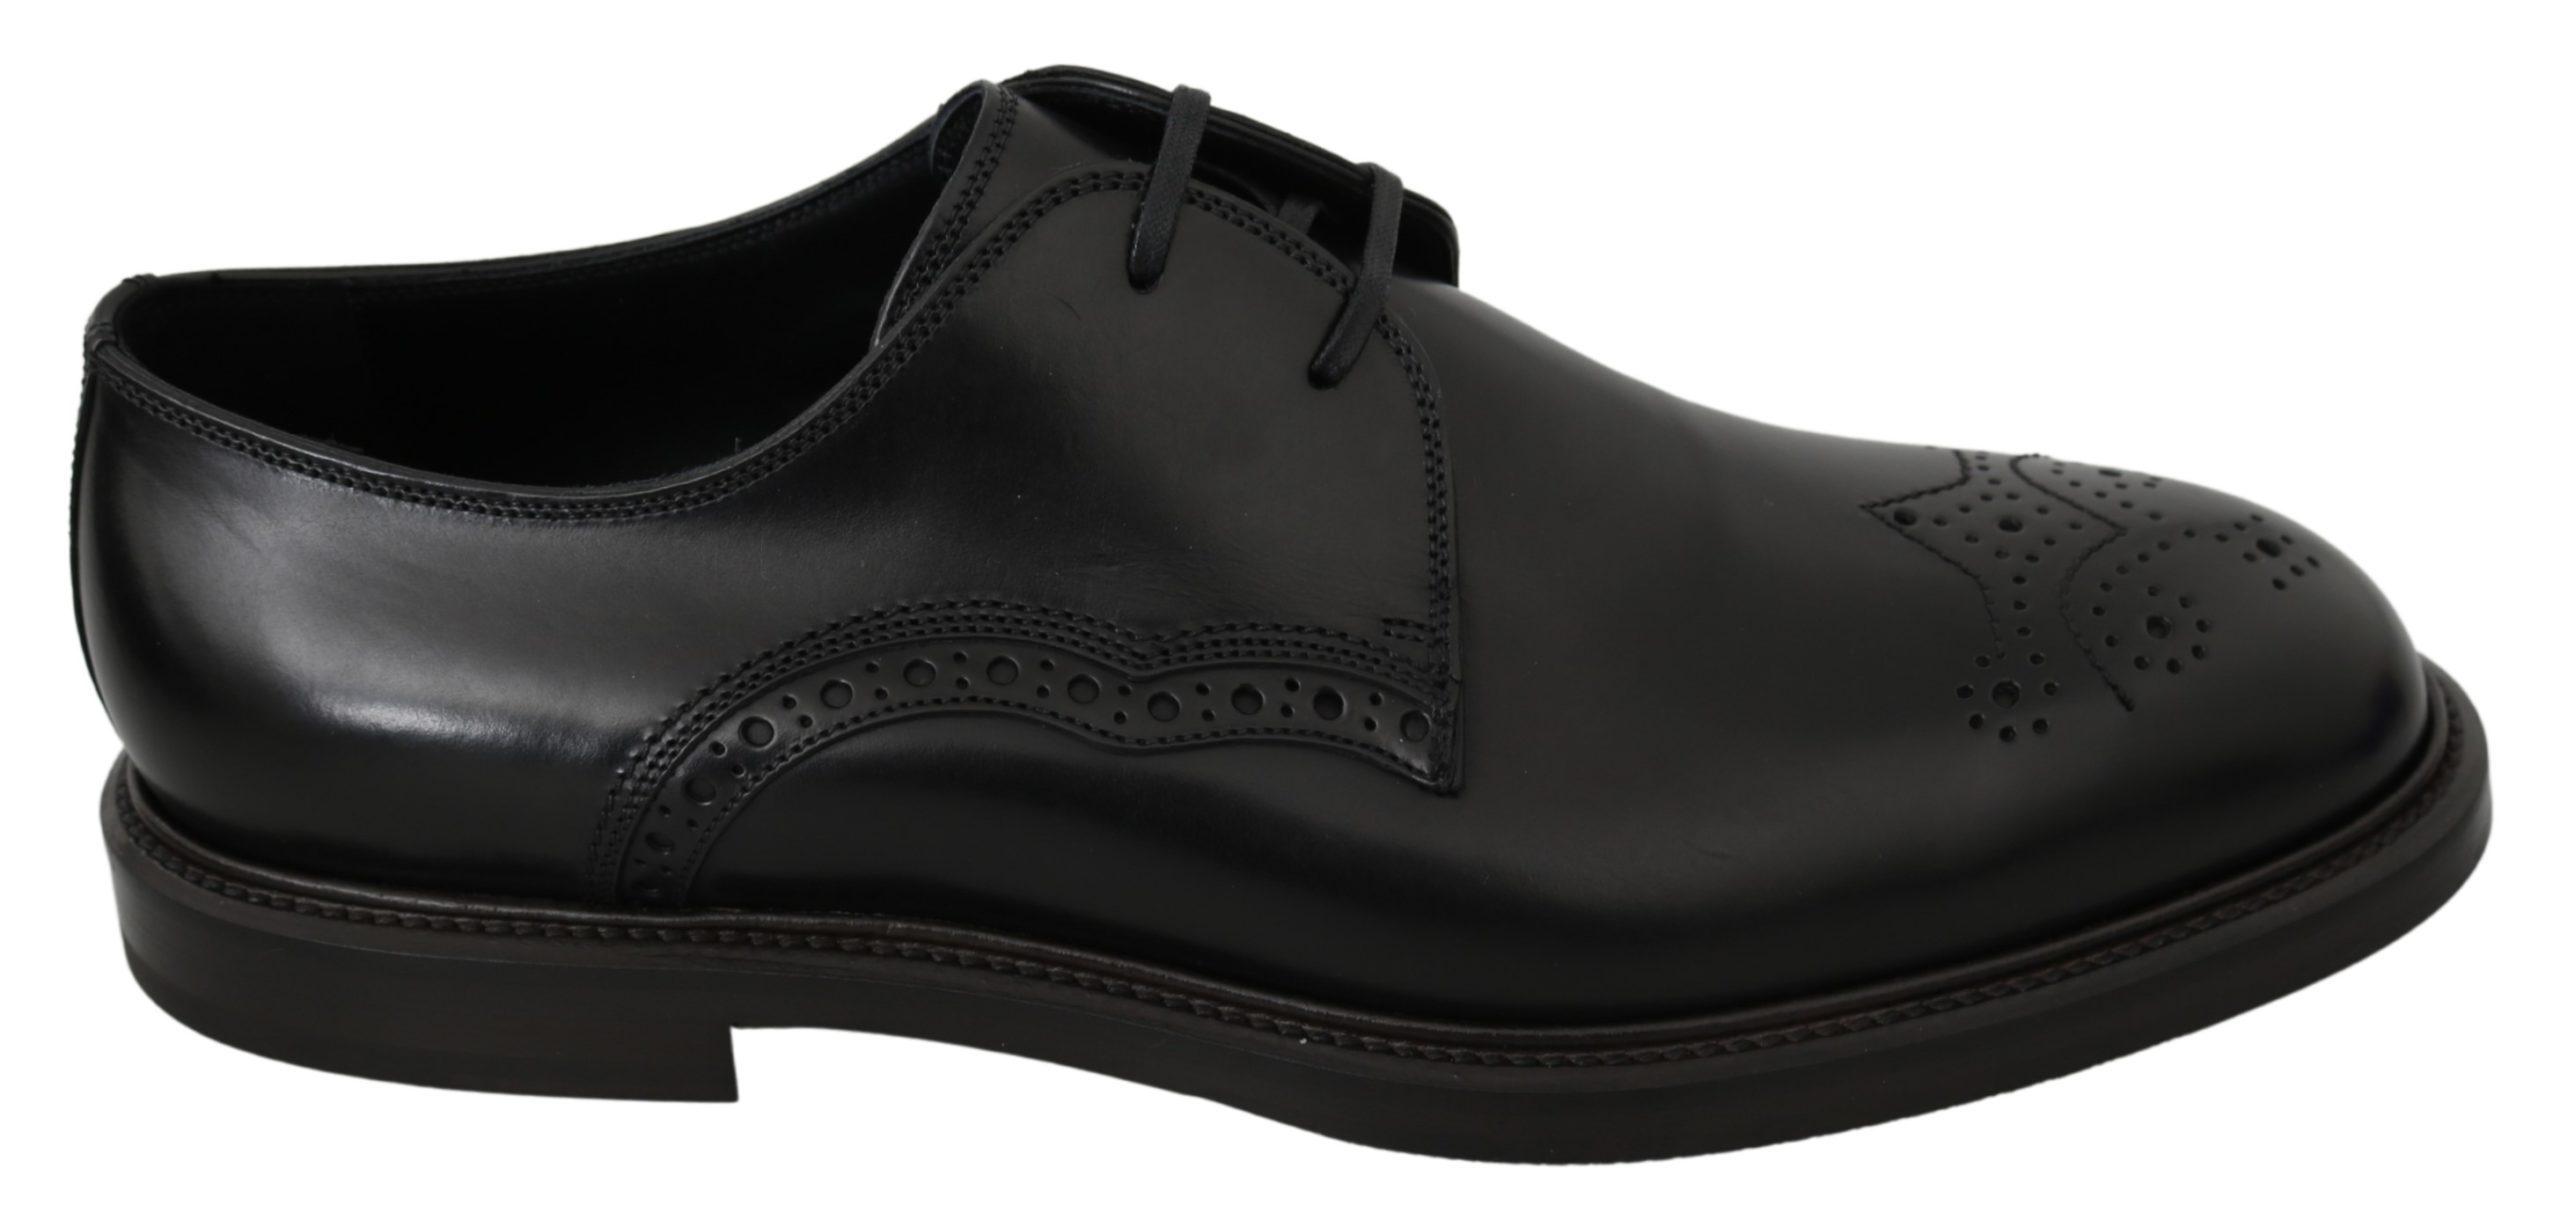 Dolce & Gabbana Men's Leather Formal Derby Shoe Black MV2897 - EU42/US9